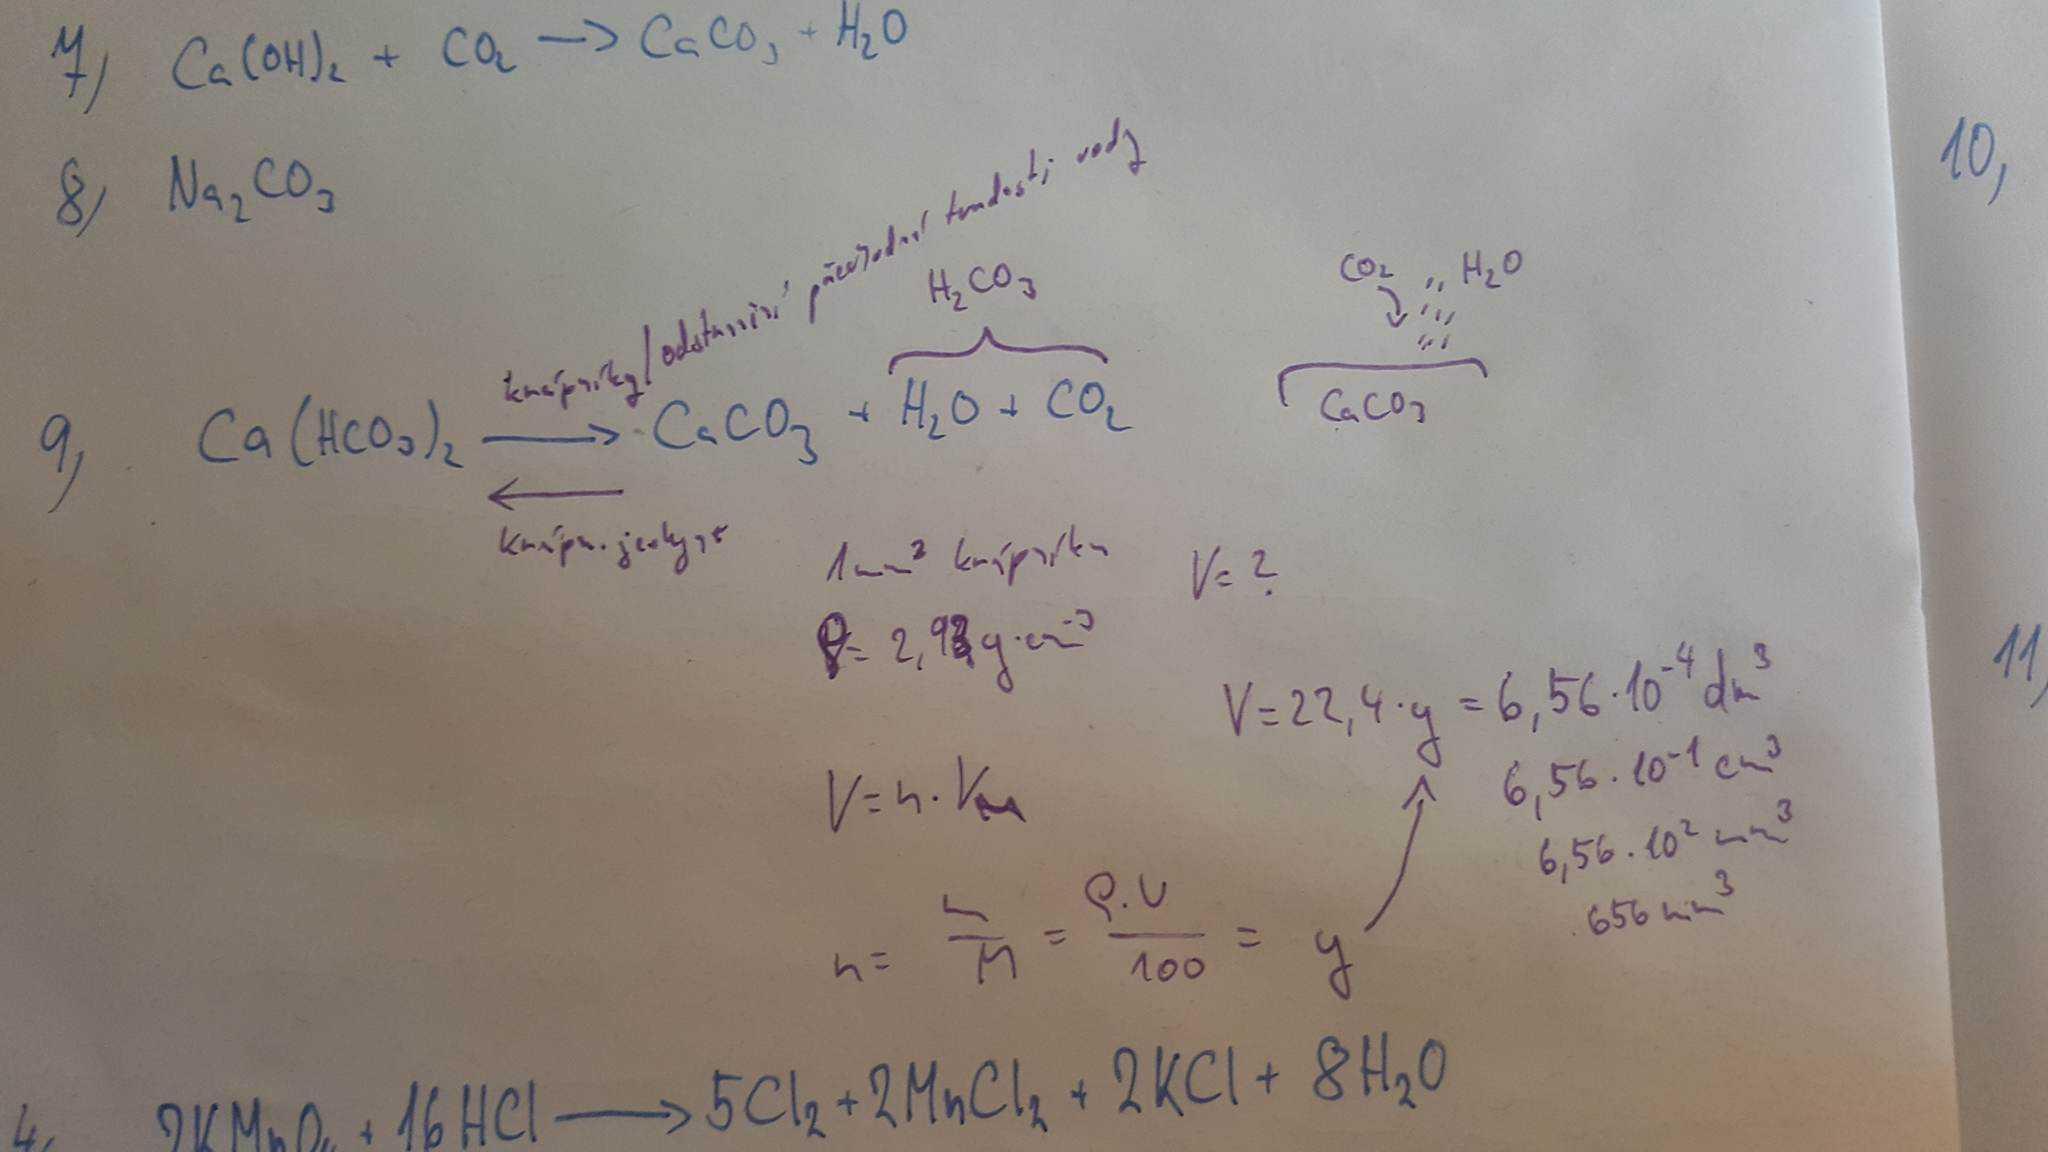 http://forum.matematika.cz/upload3/img/2017-12/58634_25467979_1624938864231480_2091505386_o.jpg